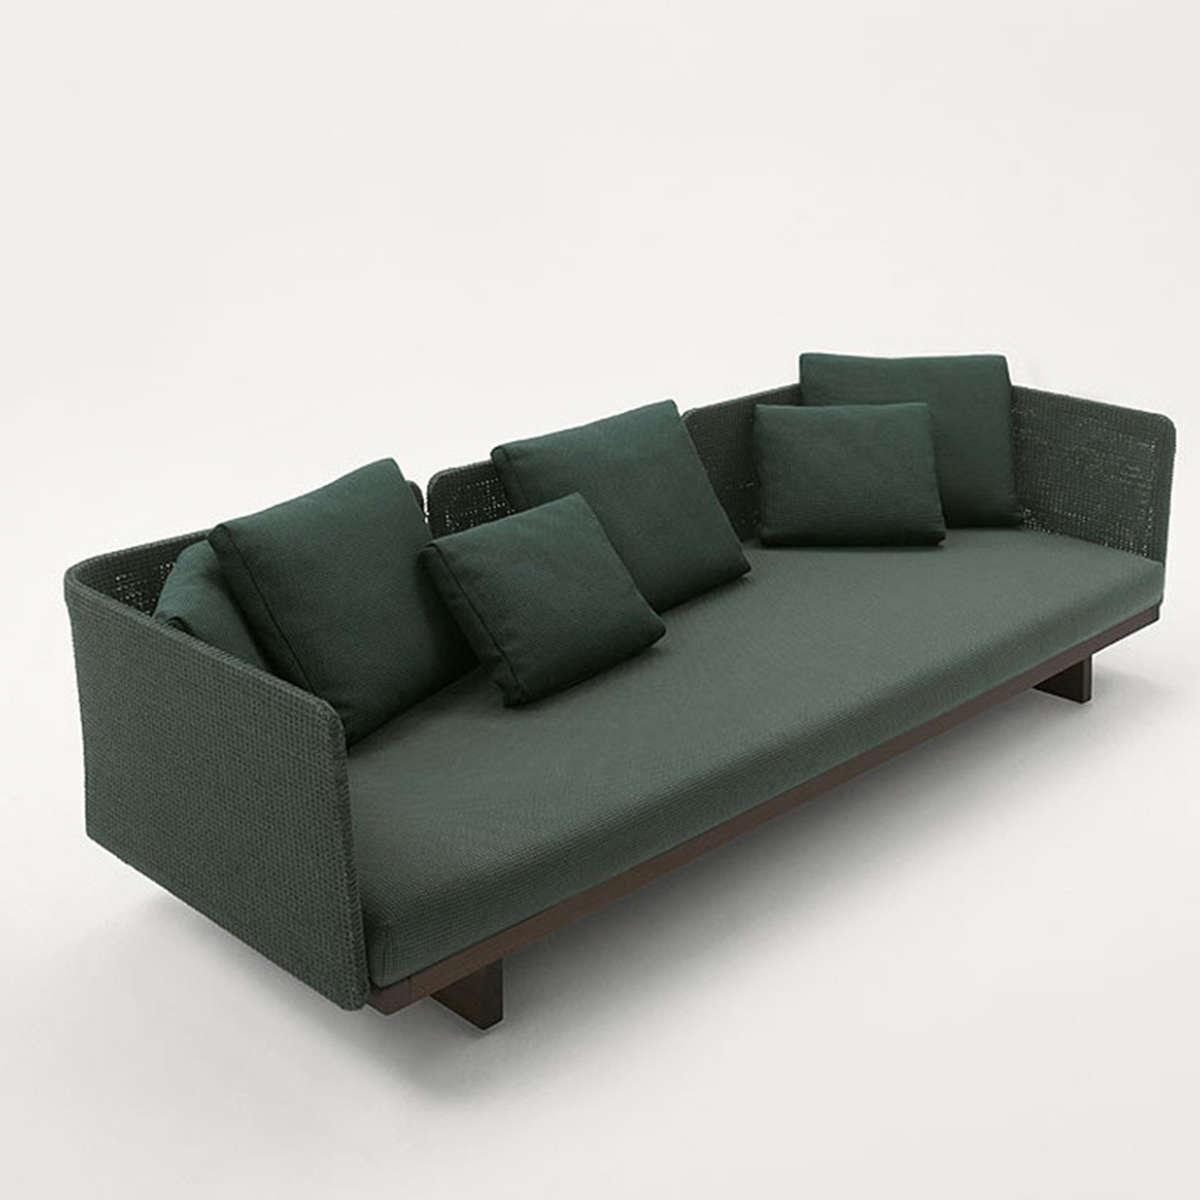 Sabi Sofa Studio Green